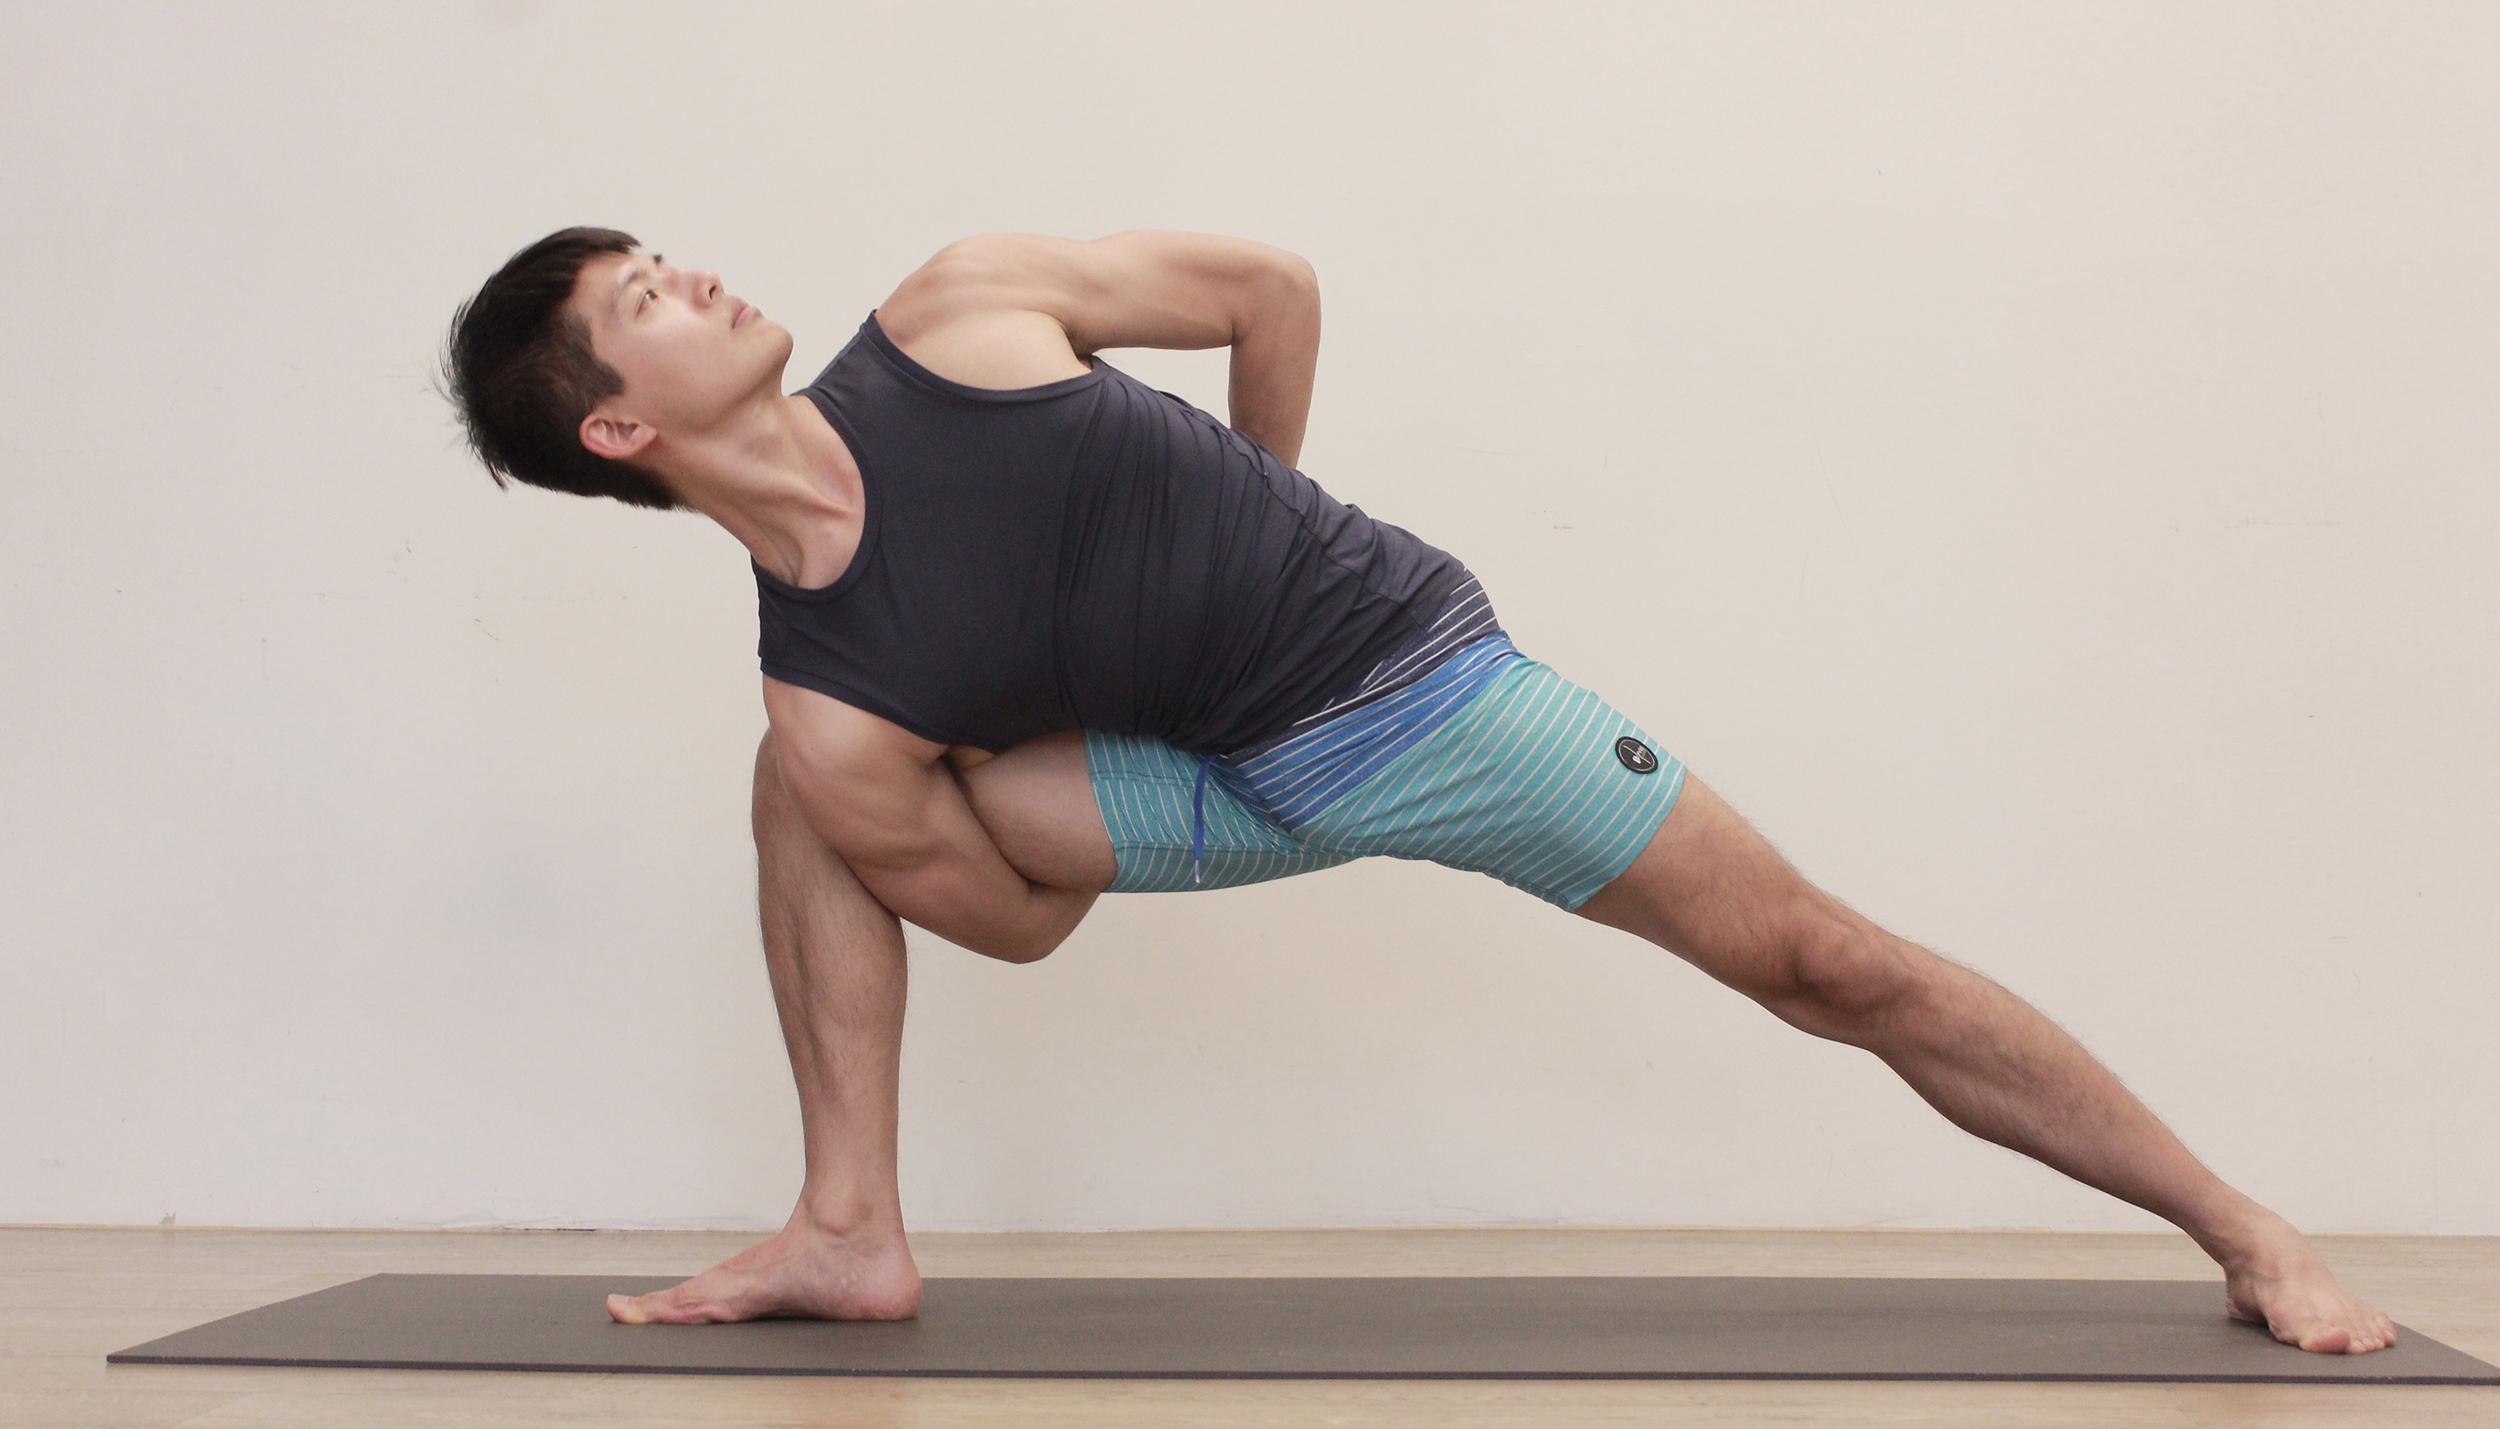 Yoga Teacher — Nick<br /><p>曾經夢想成為社會學家,喜歡旅行與書寫的Nick,熱衷於觀察、體驗、並探索生活的意義,希望成為美好價值的分享者,讓更多人得到均衡與滿足的快樂。</p>